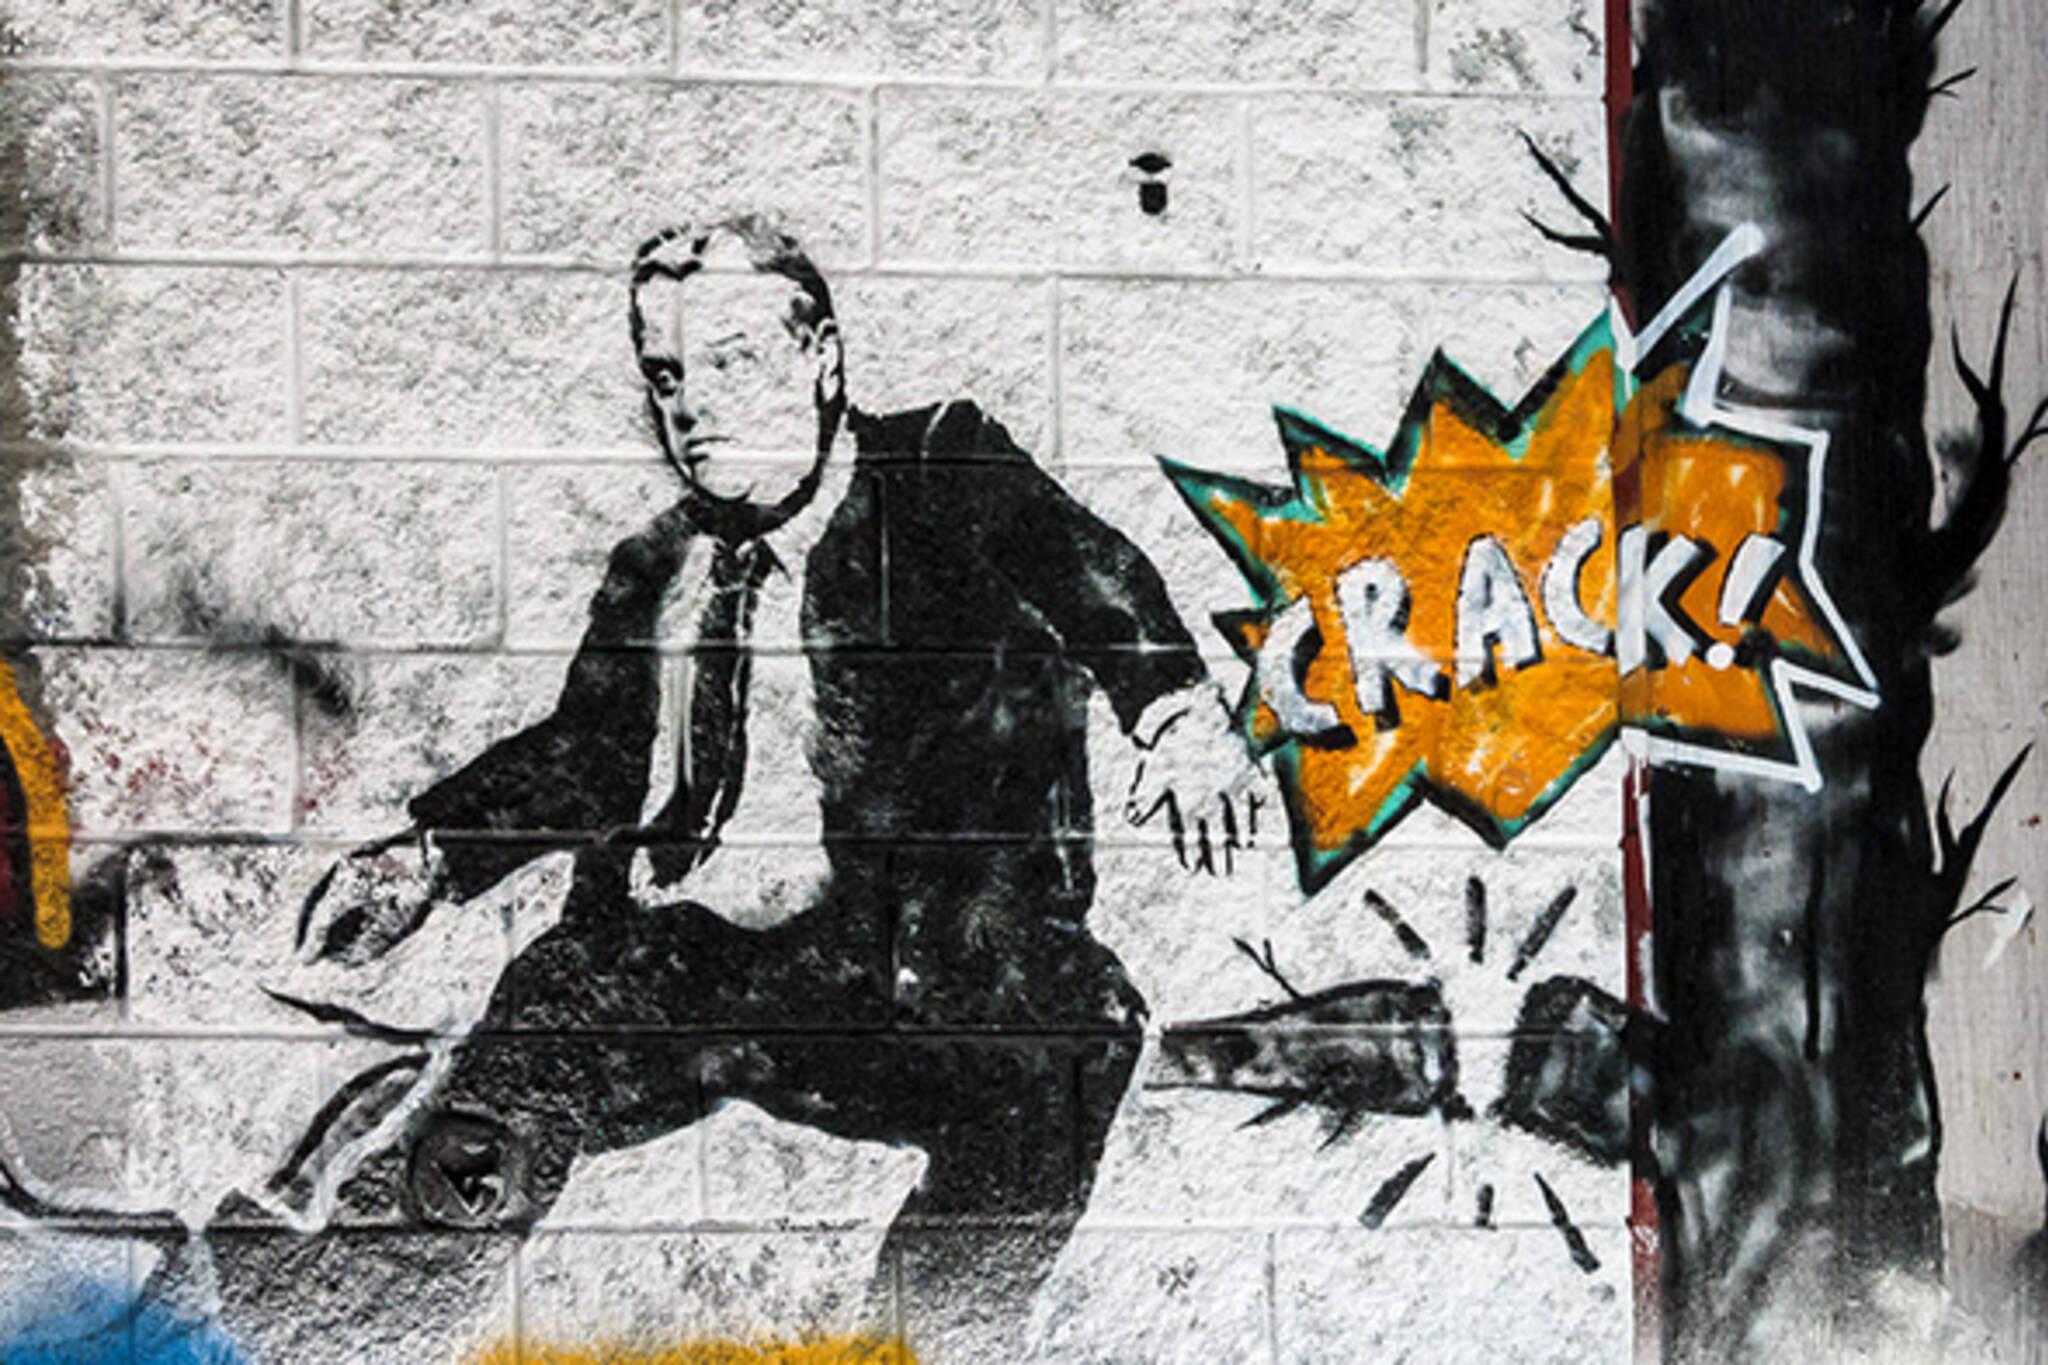 Crack mayor